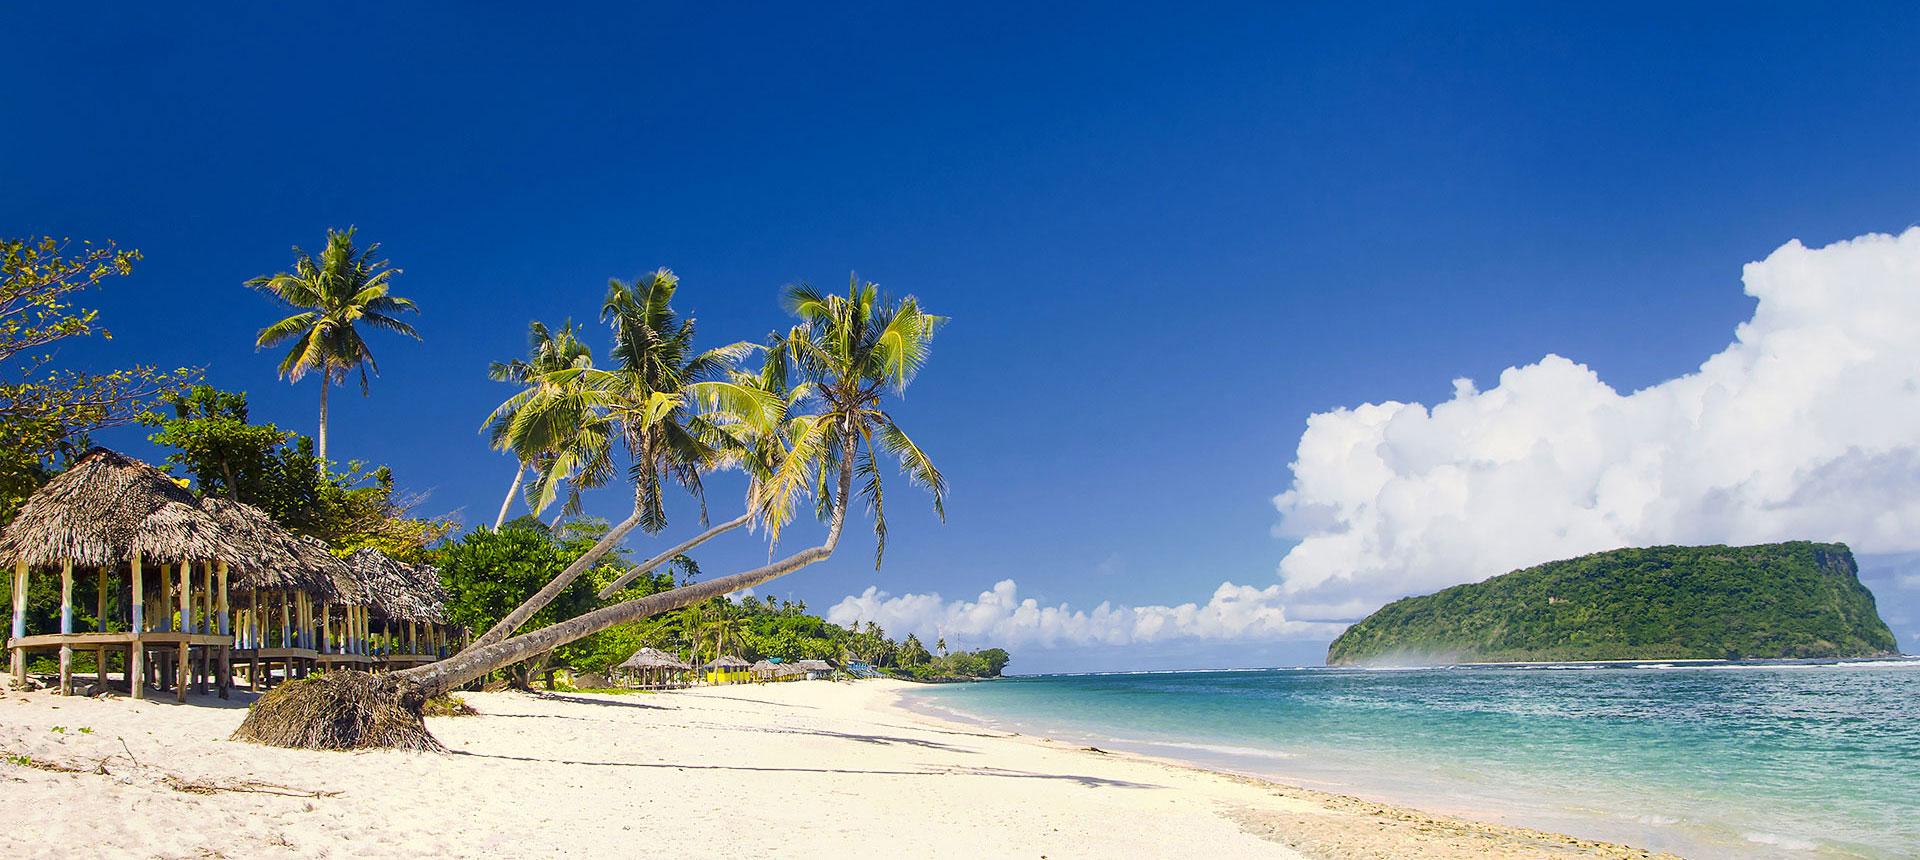 Samoa Accommodation Top Samoa Hotels Resorts And Cars